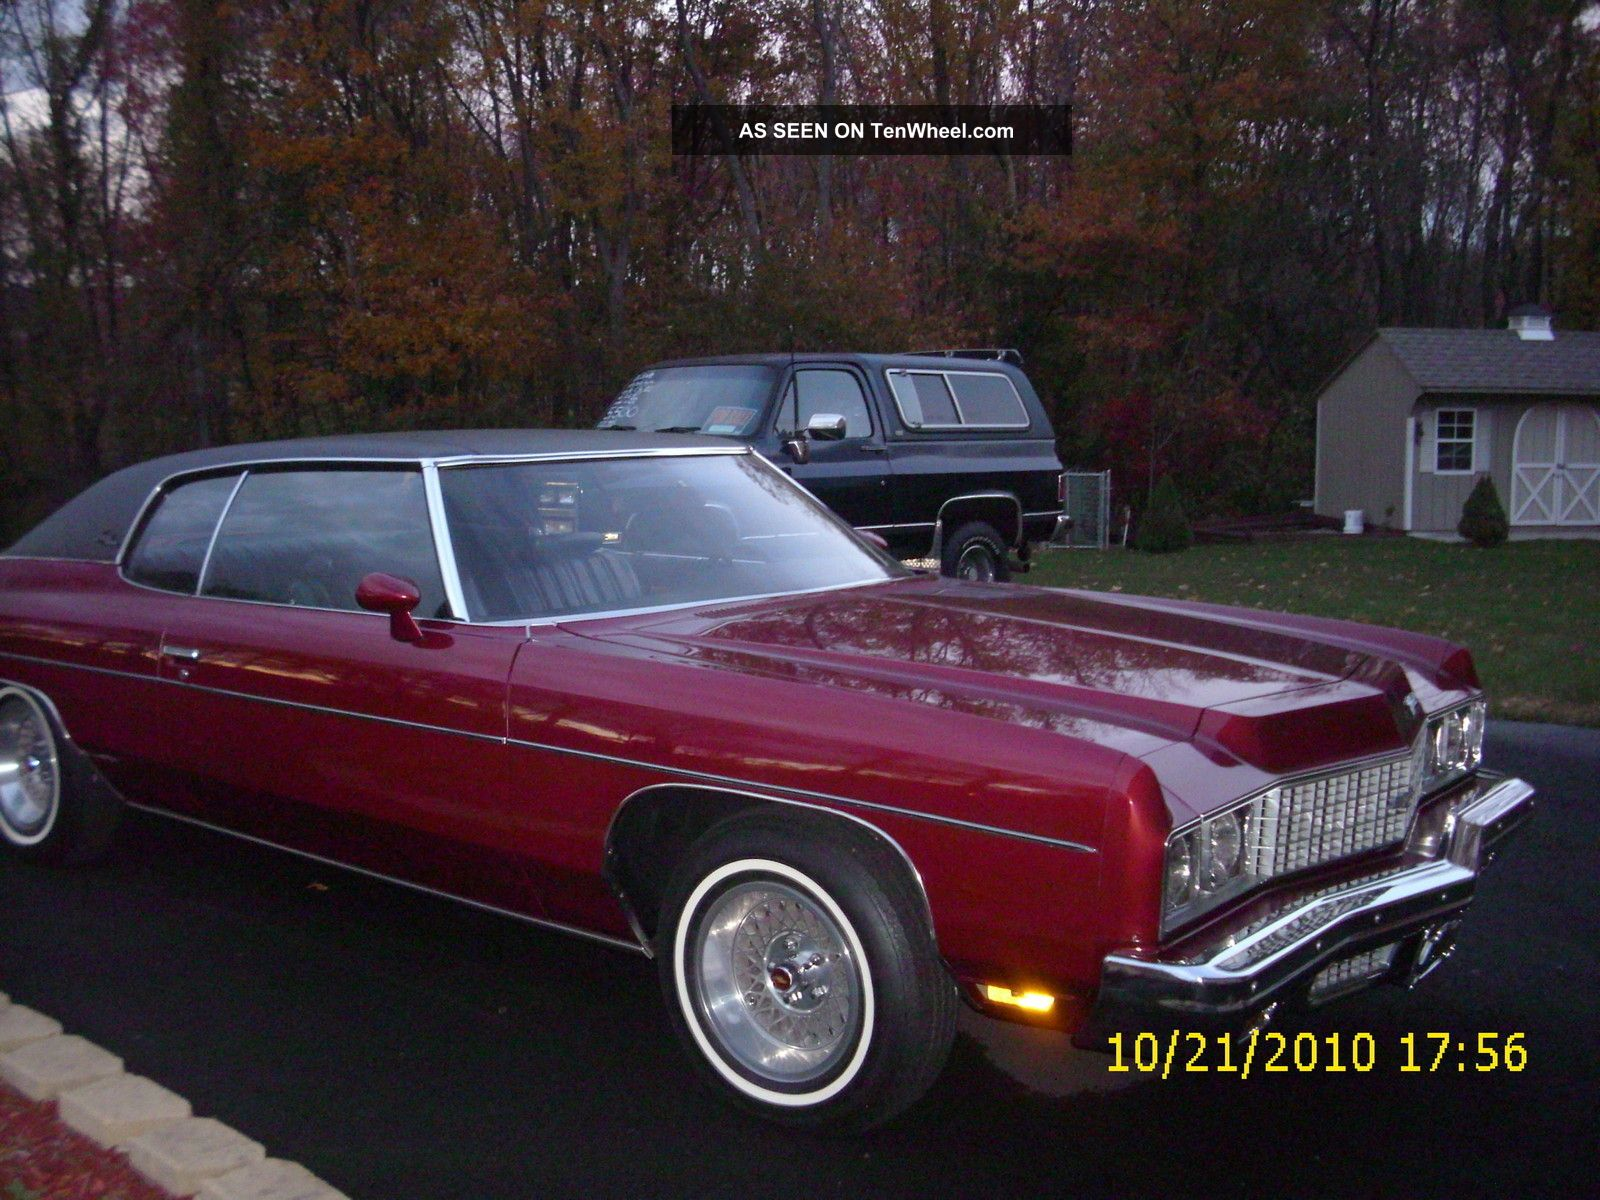 1973 Chevy Impala Custom. .  Burgundy With Black Vinyl Roof. Impala photo